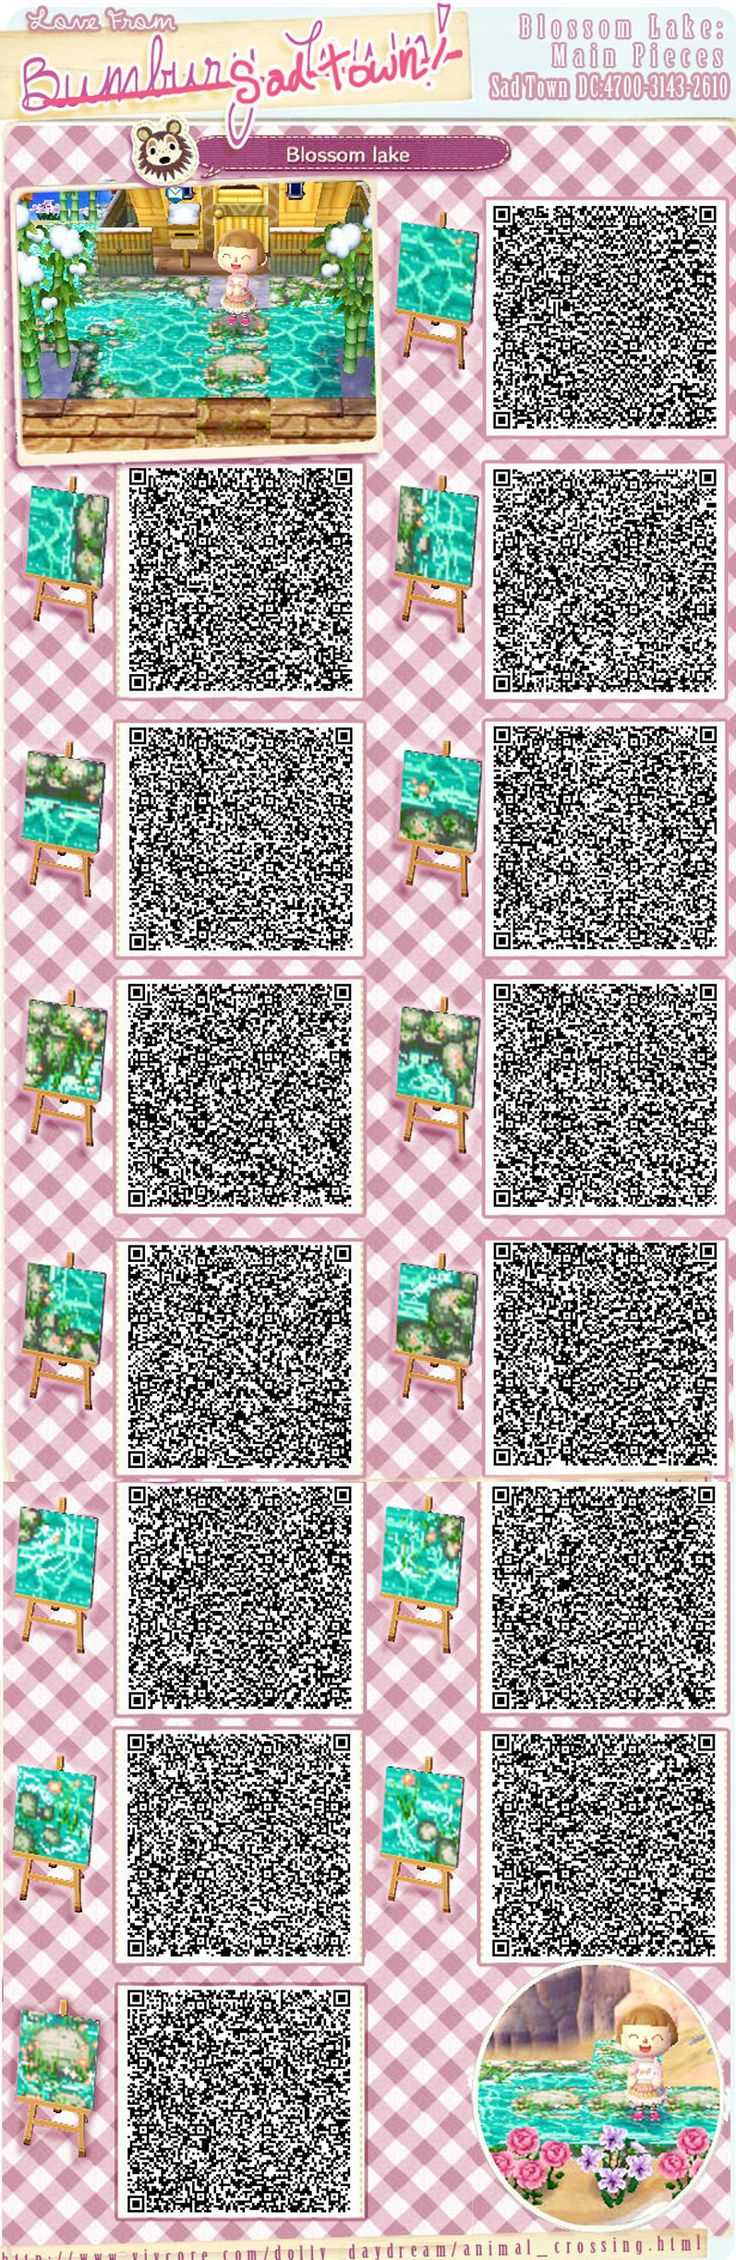 Animal Crossing Qr Codes Floor Stone